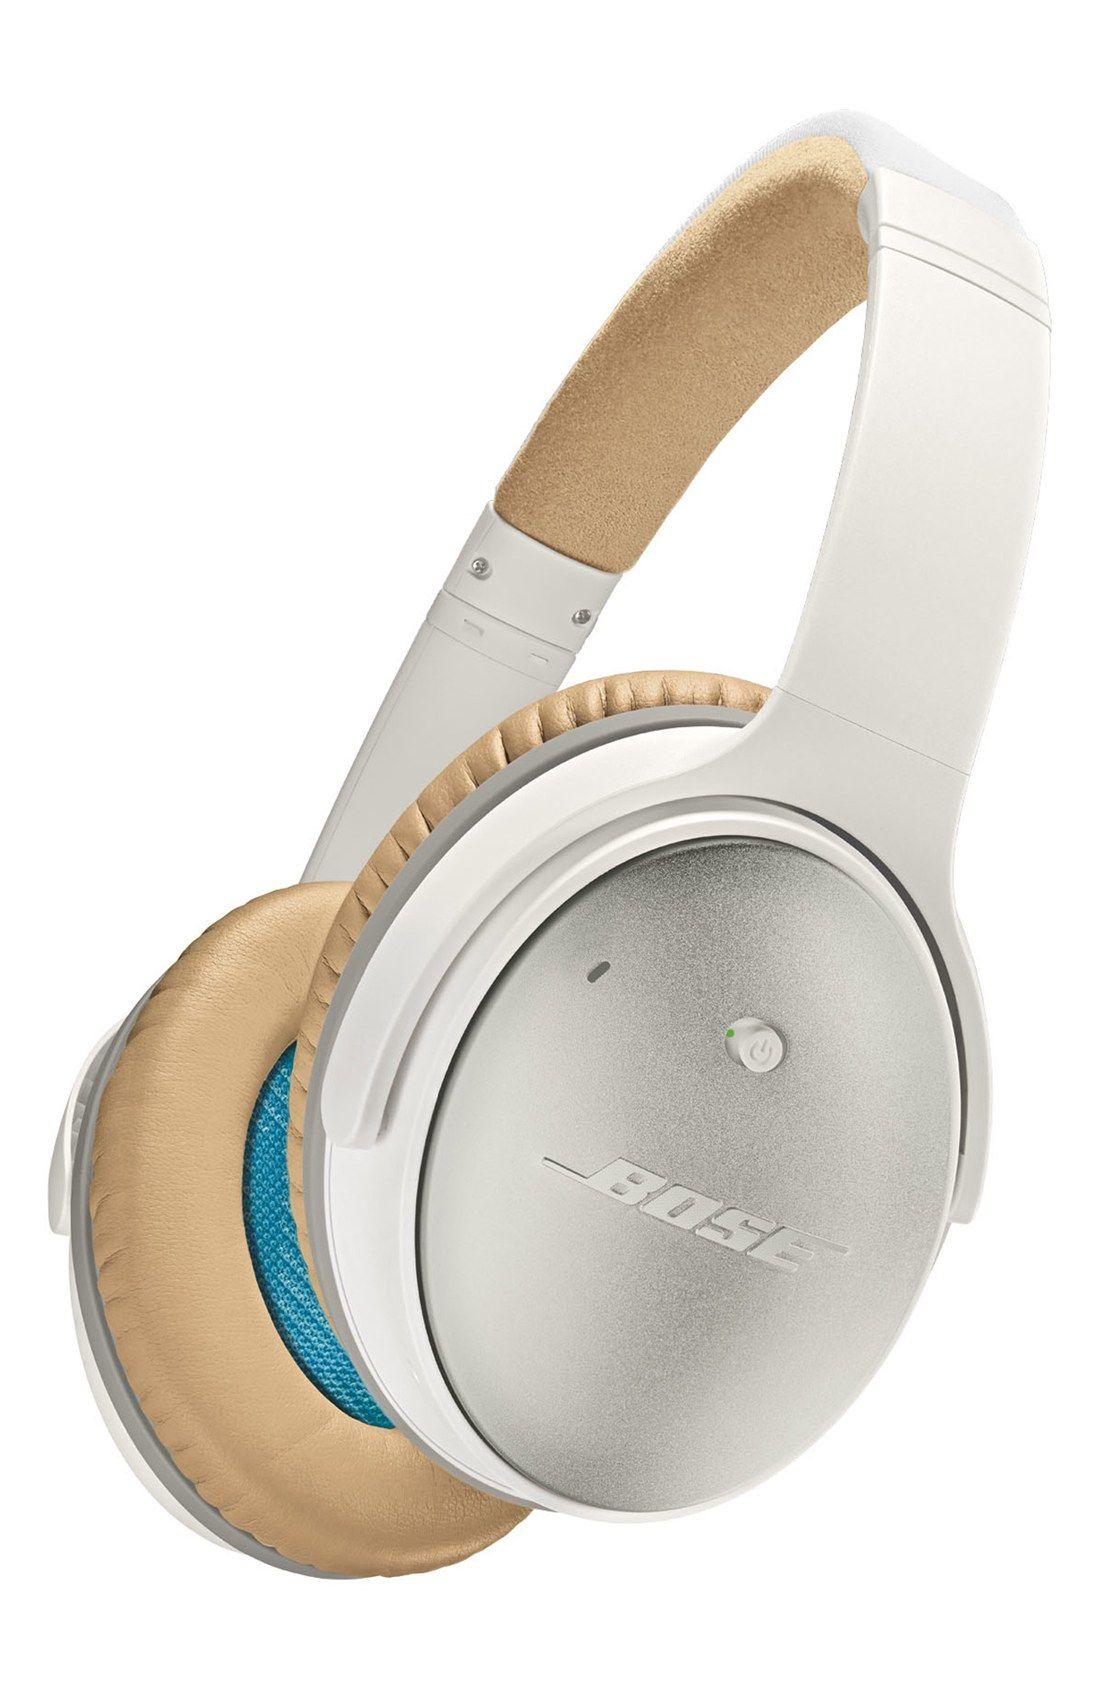 Bose Quietcomfort 25 Acoustic Noise Cancelling Android Headphones Noise Cancelling Headphones Noise Cancelling White Headphones